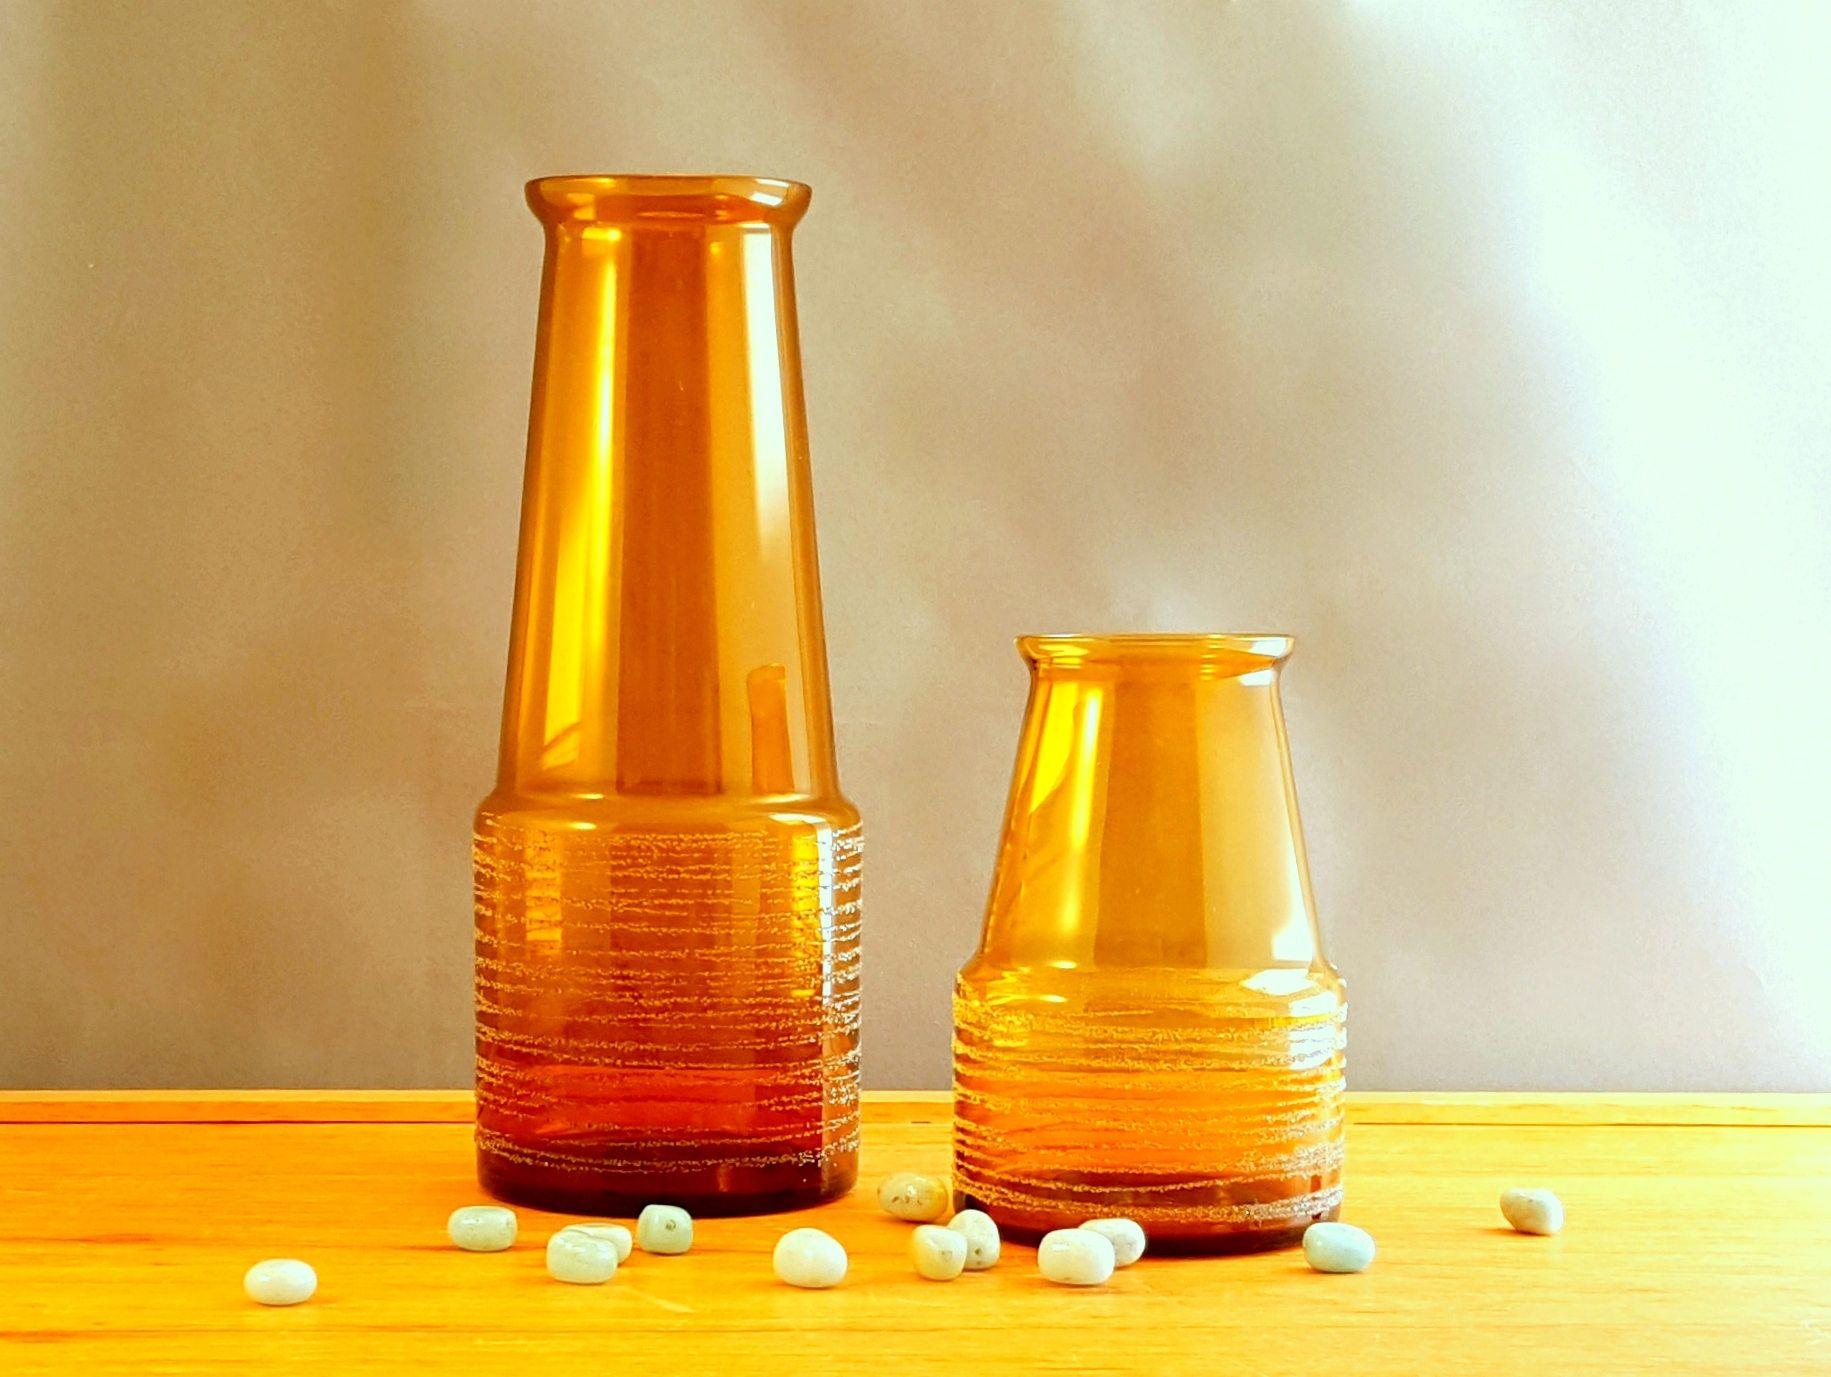 2 Vases From Sea Glasbruk Sweden Design By Rune Strand Amber Glass By Mintstuudio On Etsy Amber Glass Glass Dish Soap Bottle